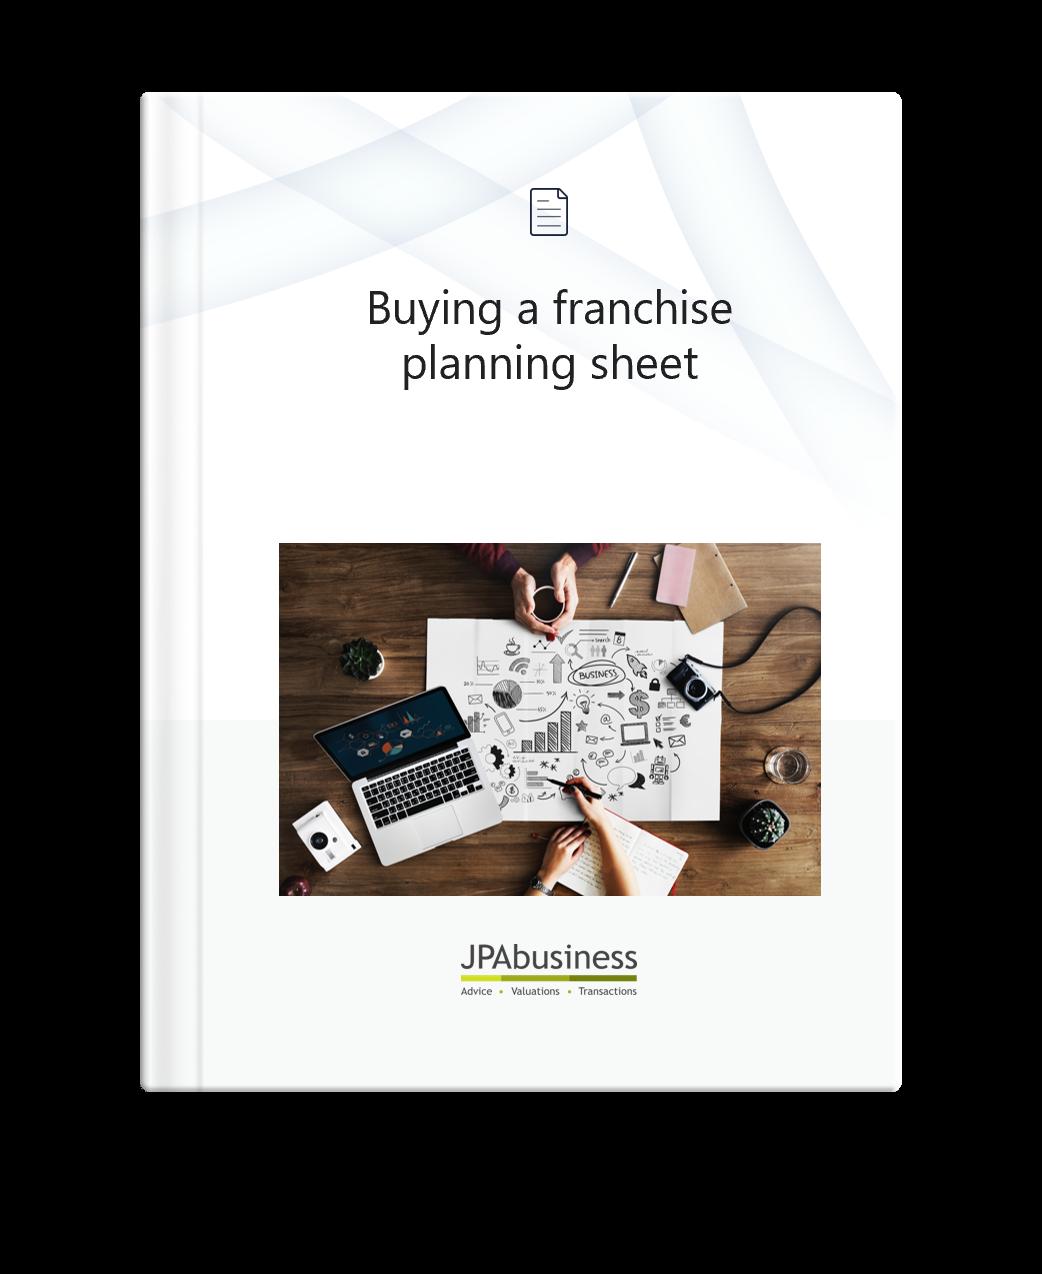 Buying a franchise planning sheet | JPAbusiness